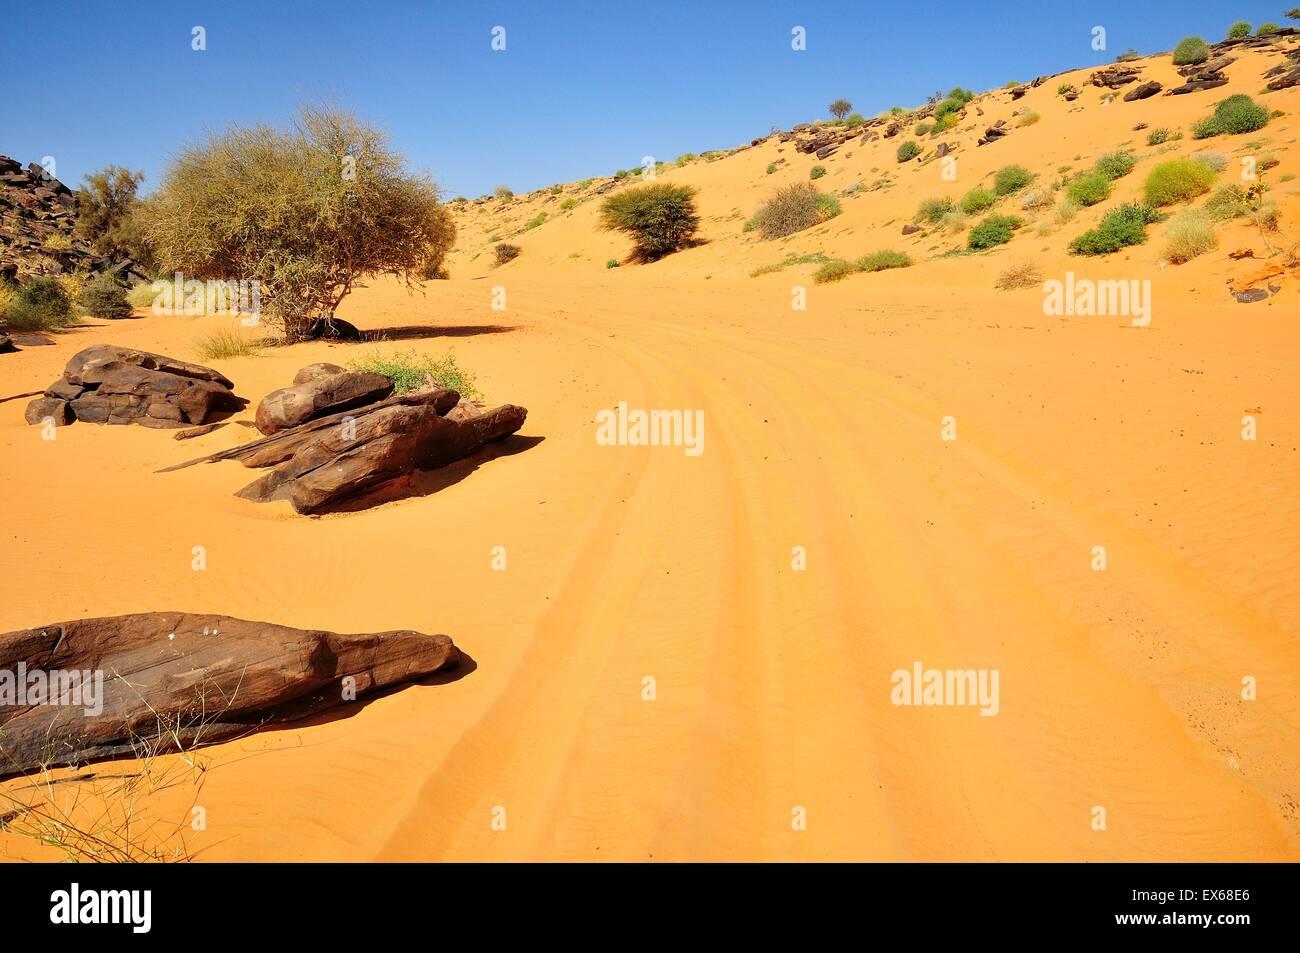 Tire tracks in the sand, route from Atar to Tidjikja, Adrar region, Mauritania - Stock Image